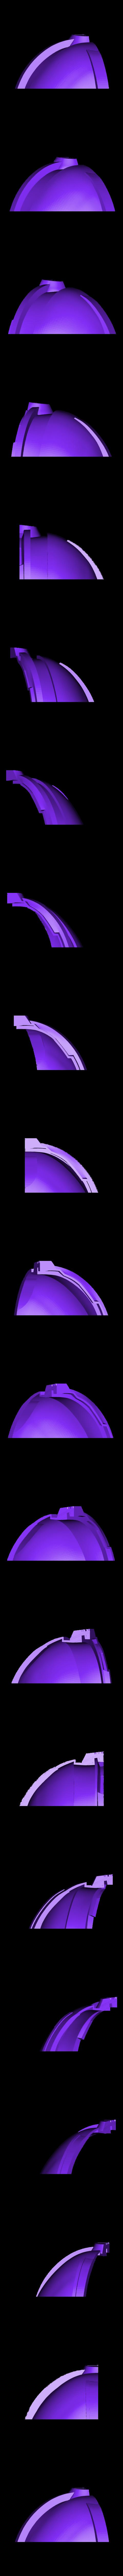 Part 1 v3.stl Download free STL file Clone Trooper Helmet Phase 2 Star Wars • 3D printable template, VillainousPropShop